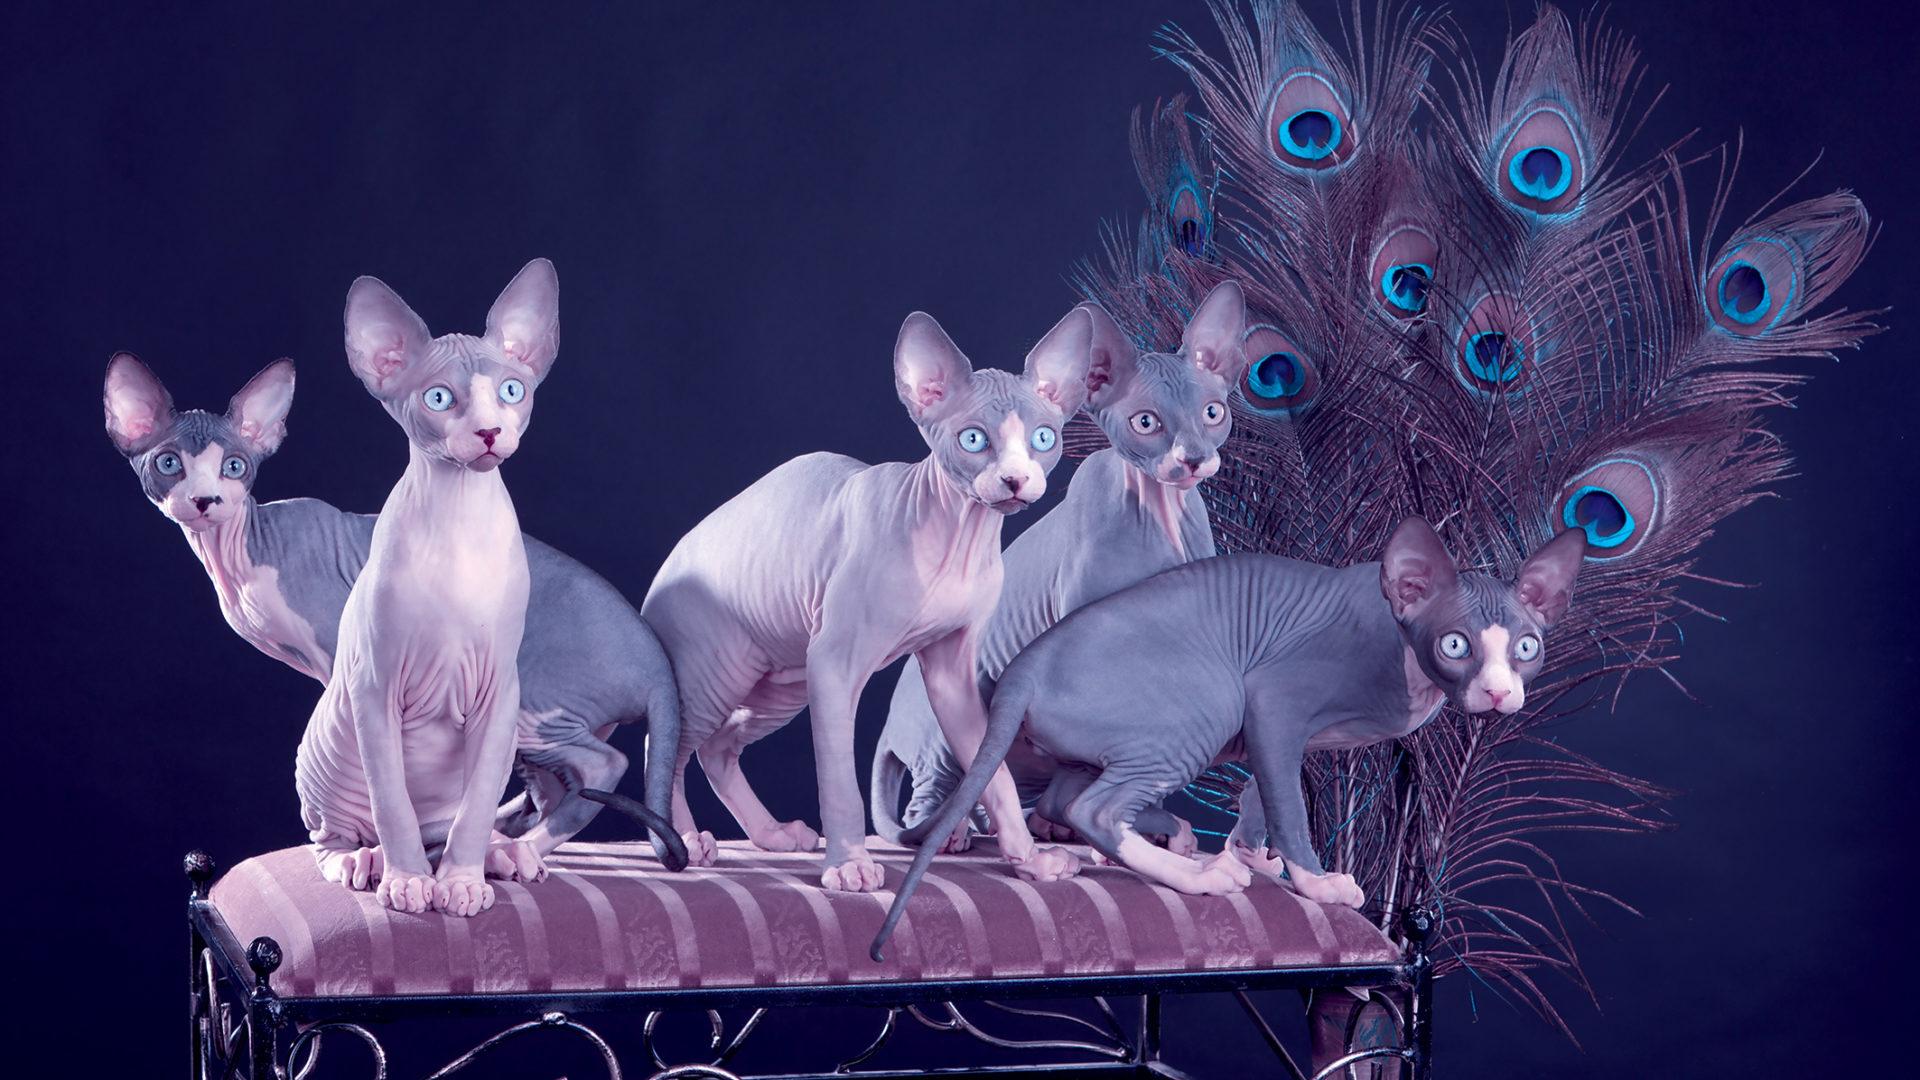 Five sphynx kitten